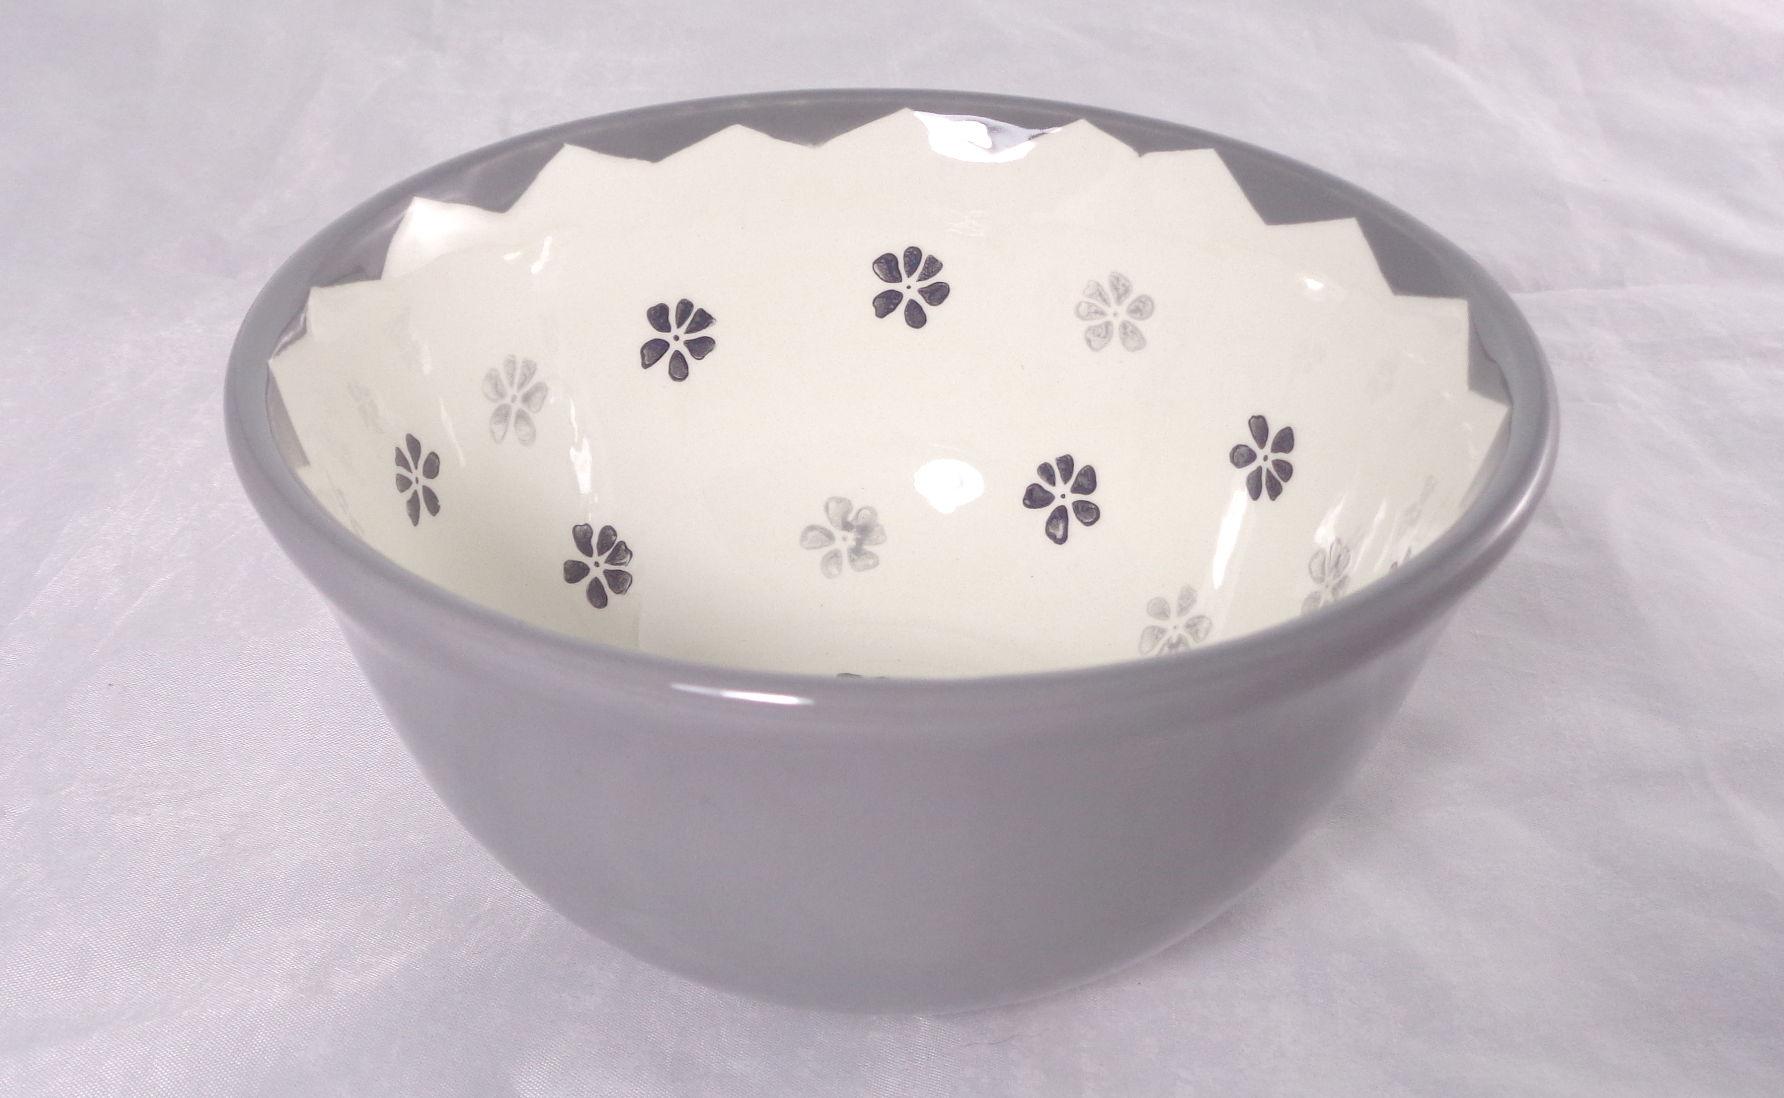 Bemalte Keramik graue Vintage-Schale